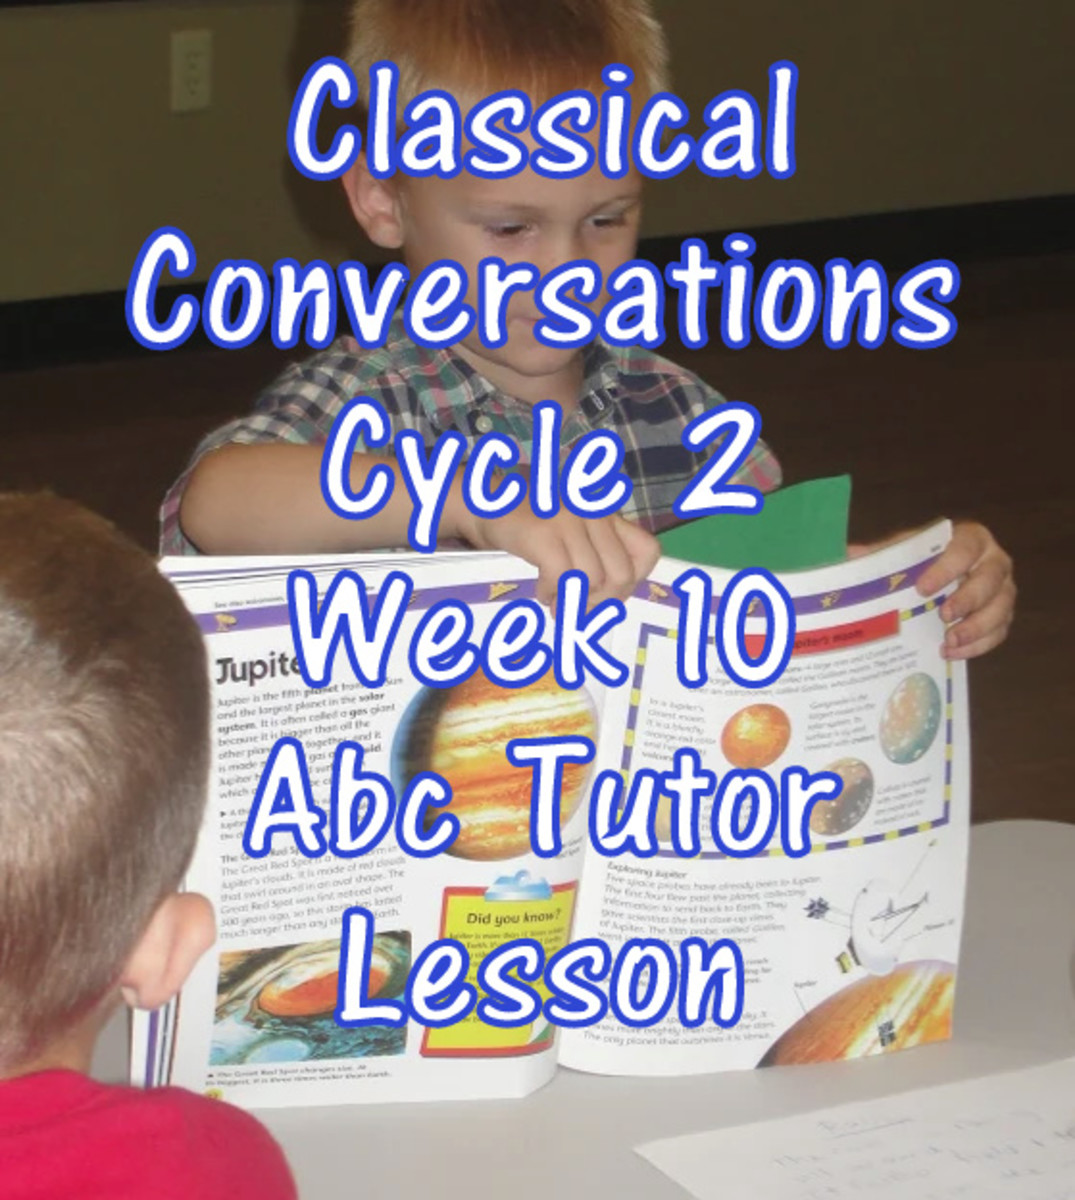 CC Classical Conversations Cycle 2 Week 10 Abc Tutor Plan